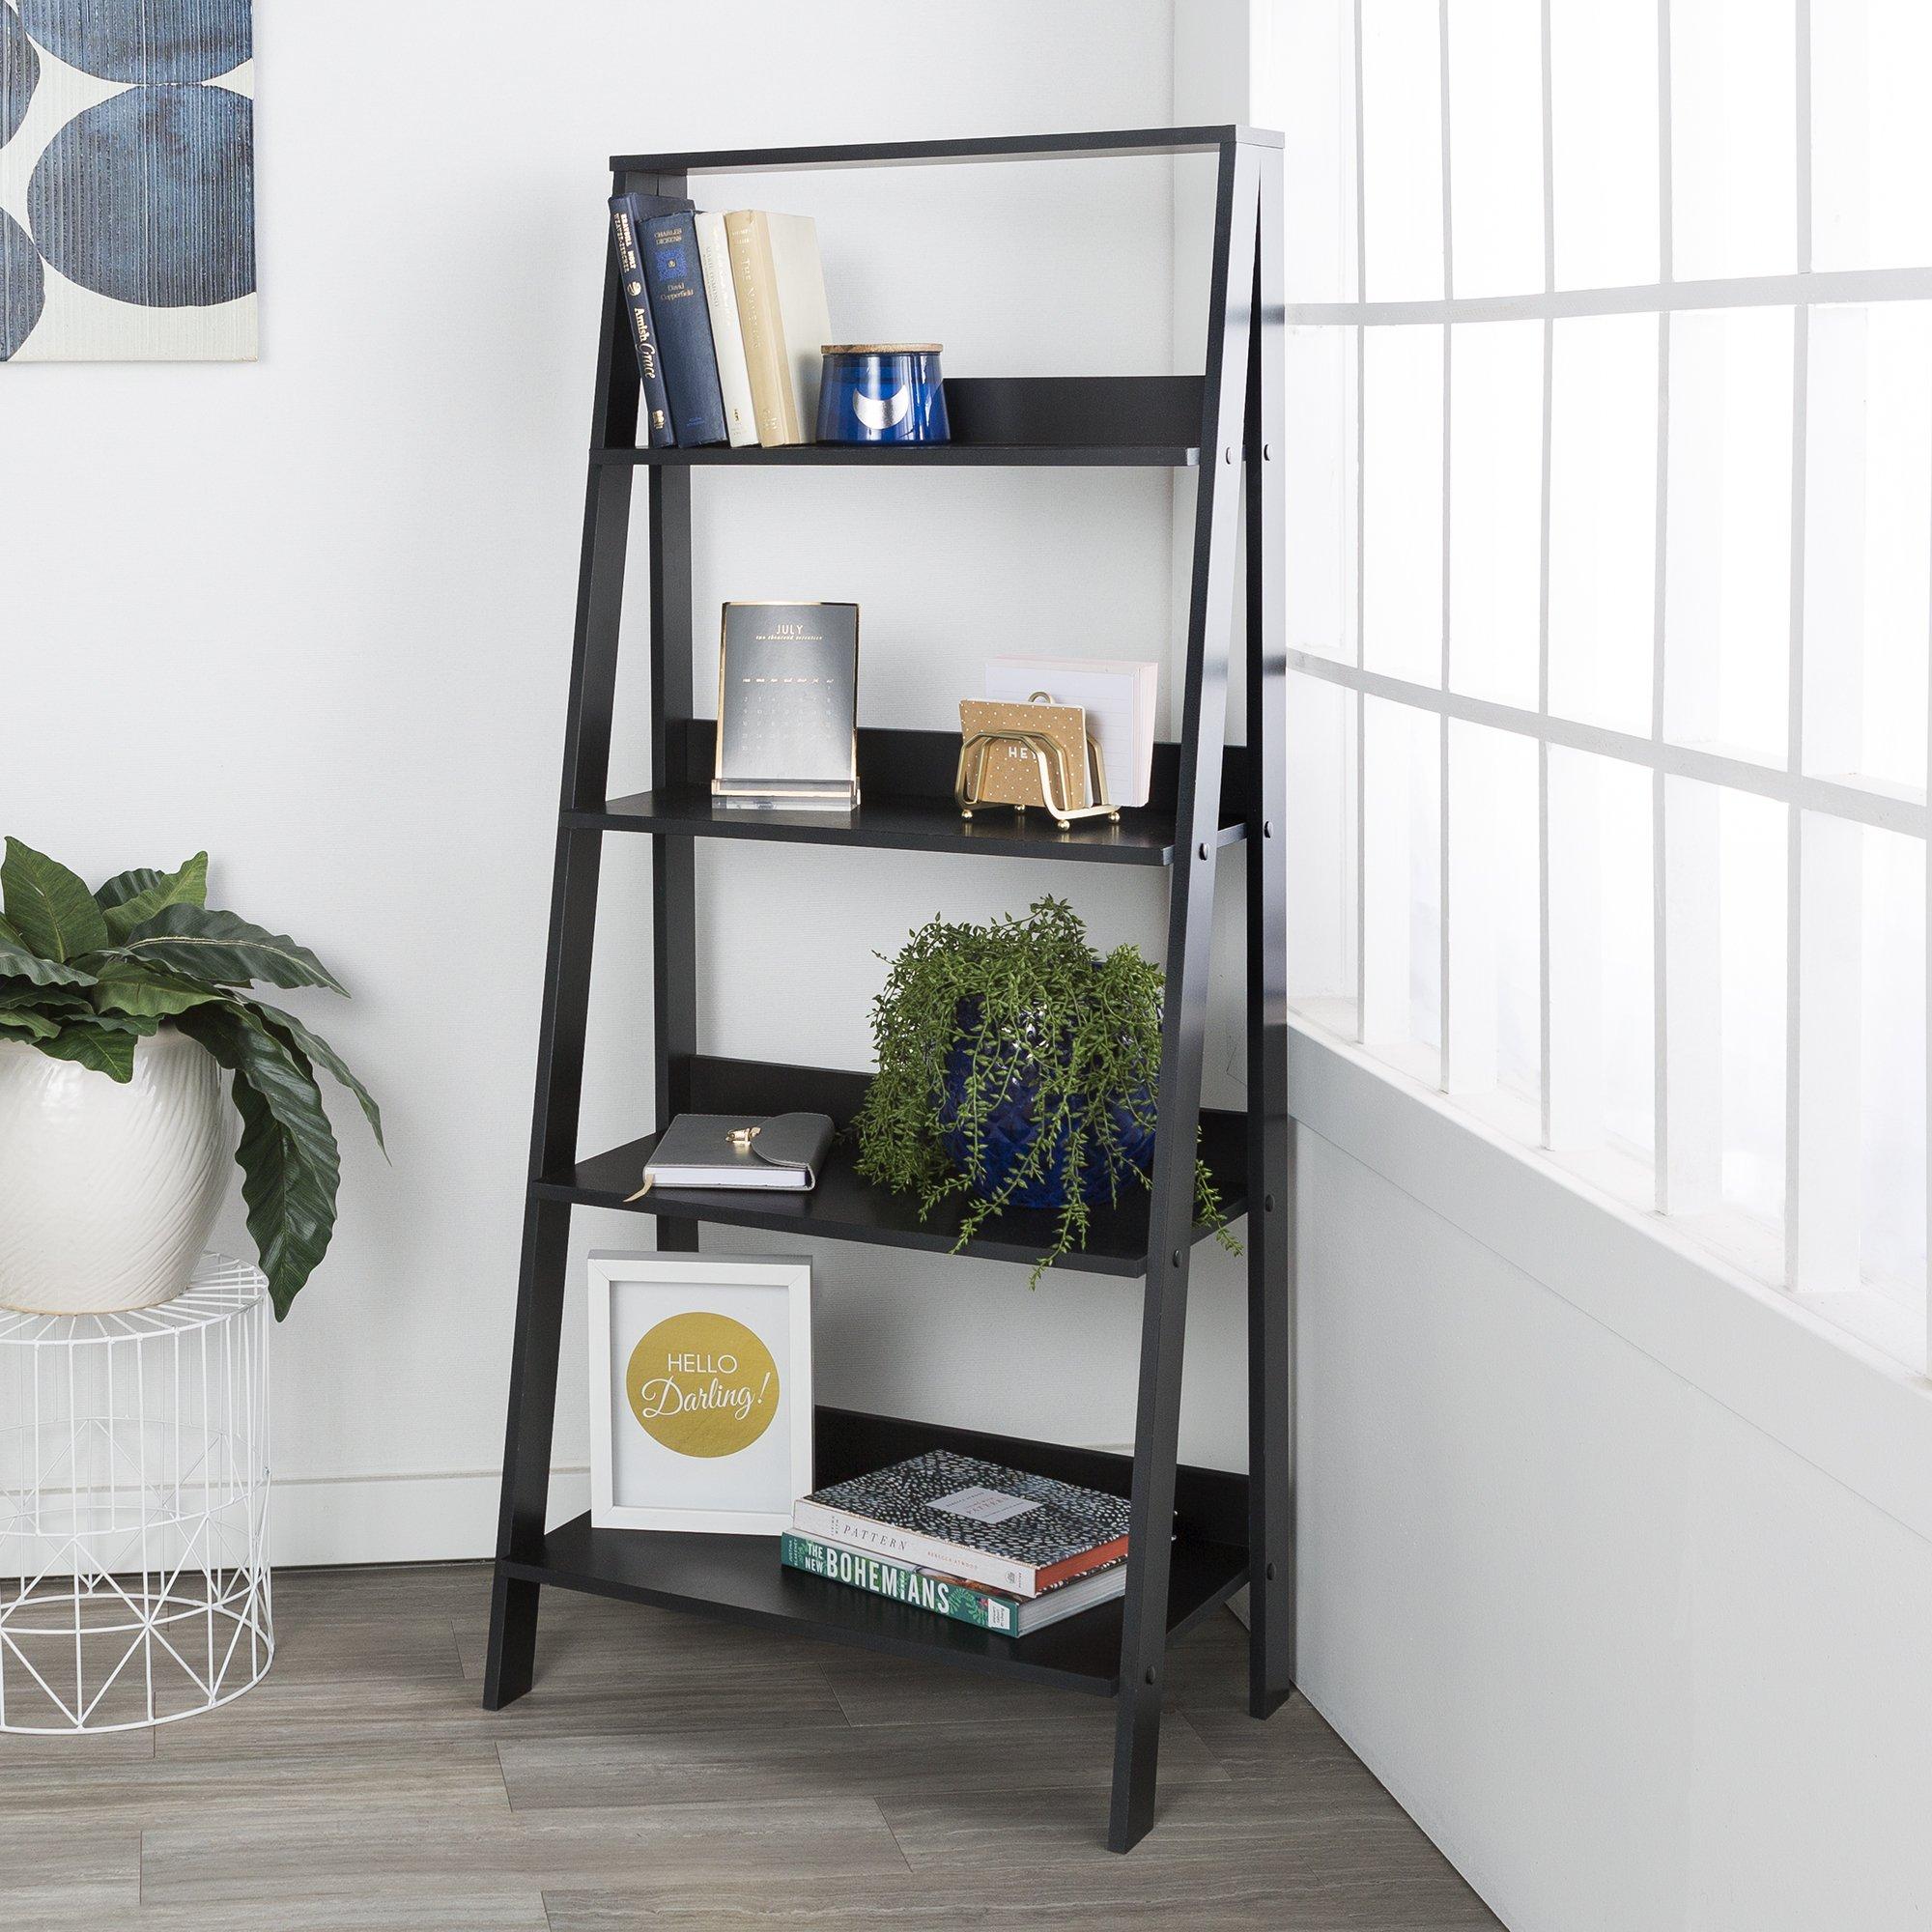 WE Furniture 55'' Wood Ladder Bookshelf - Black